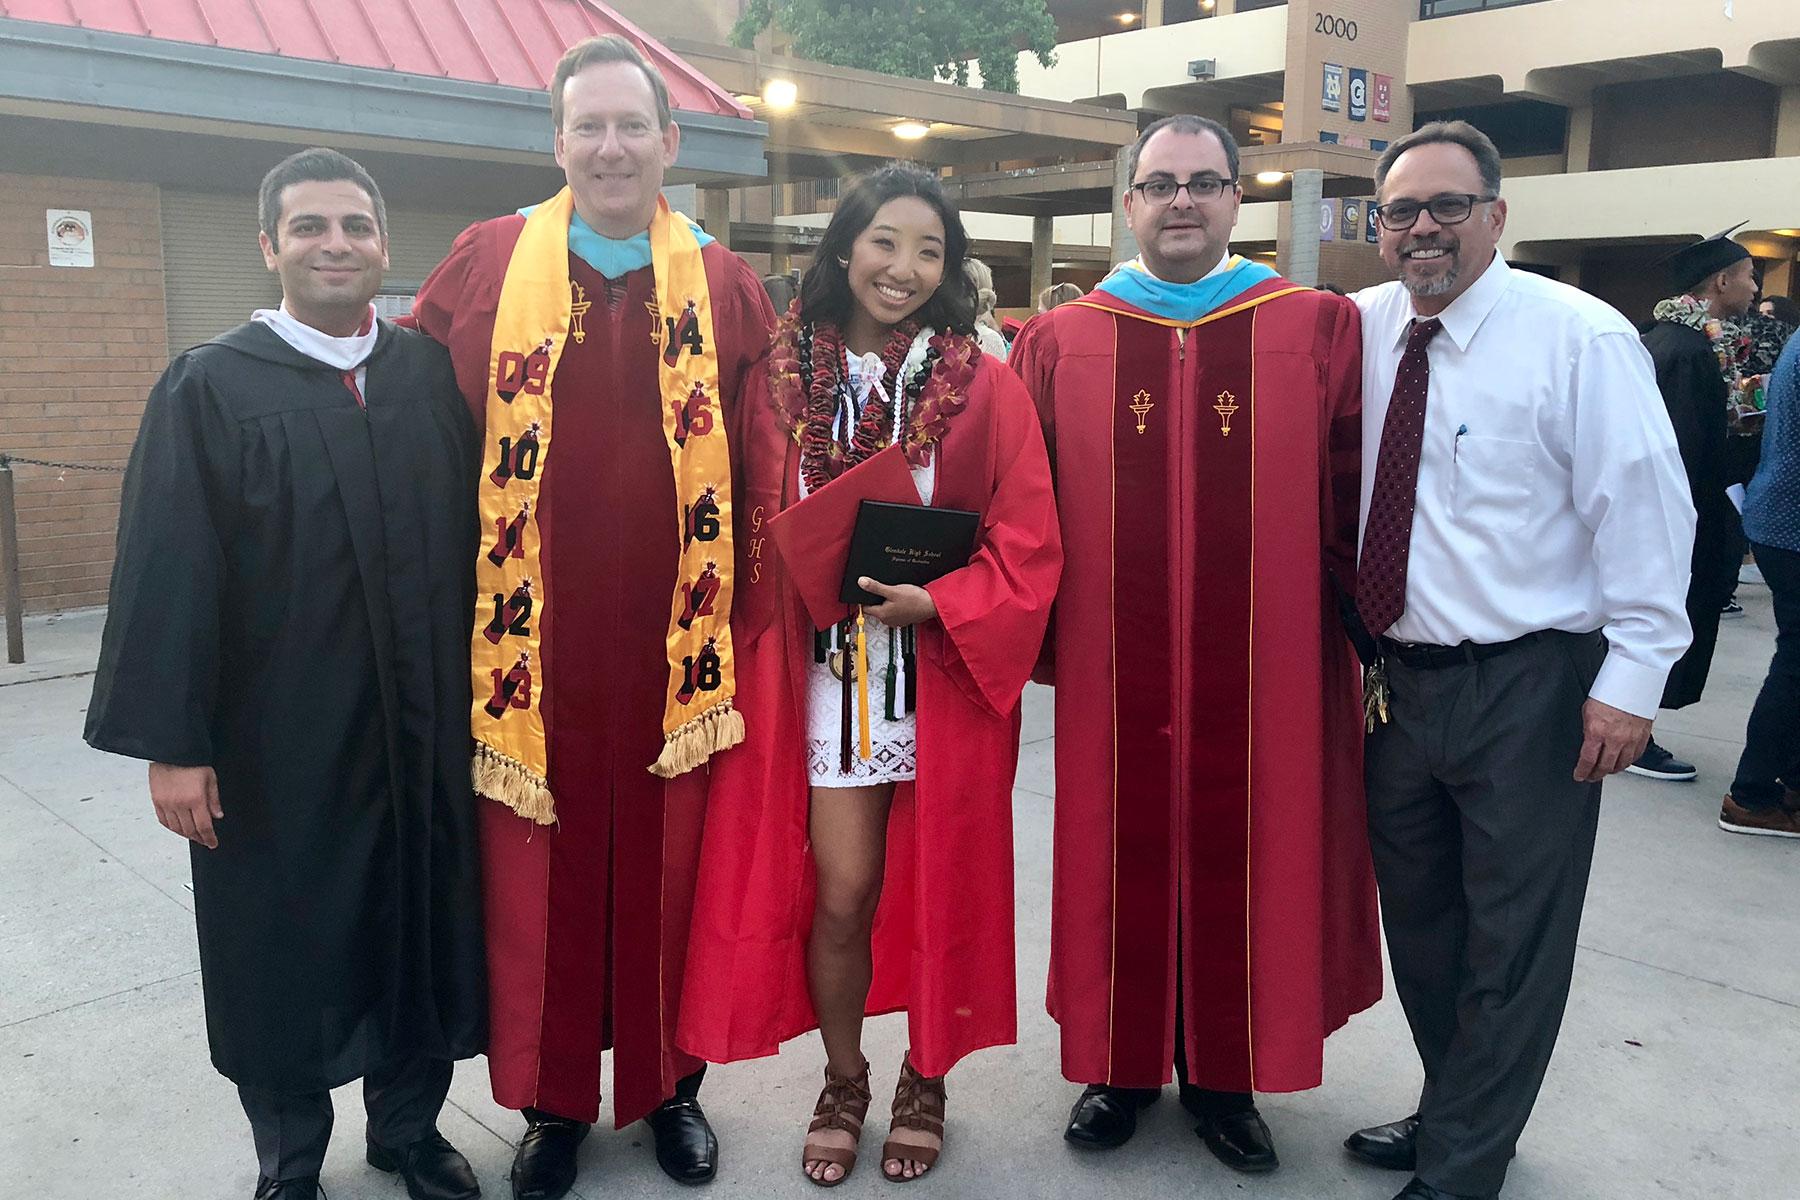 Glendale High School Graduation Ceremony June 2018